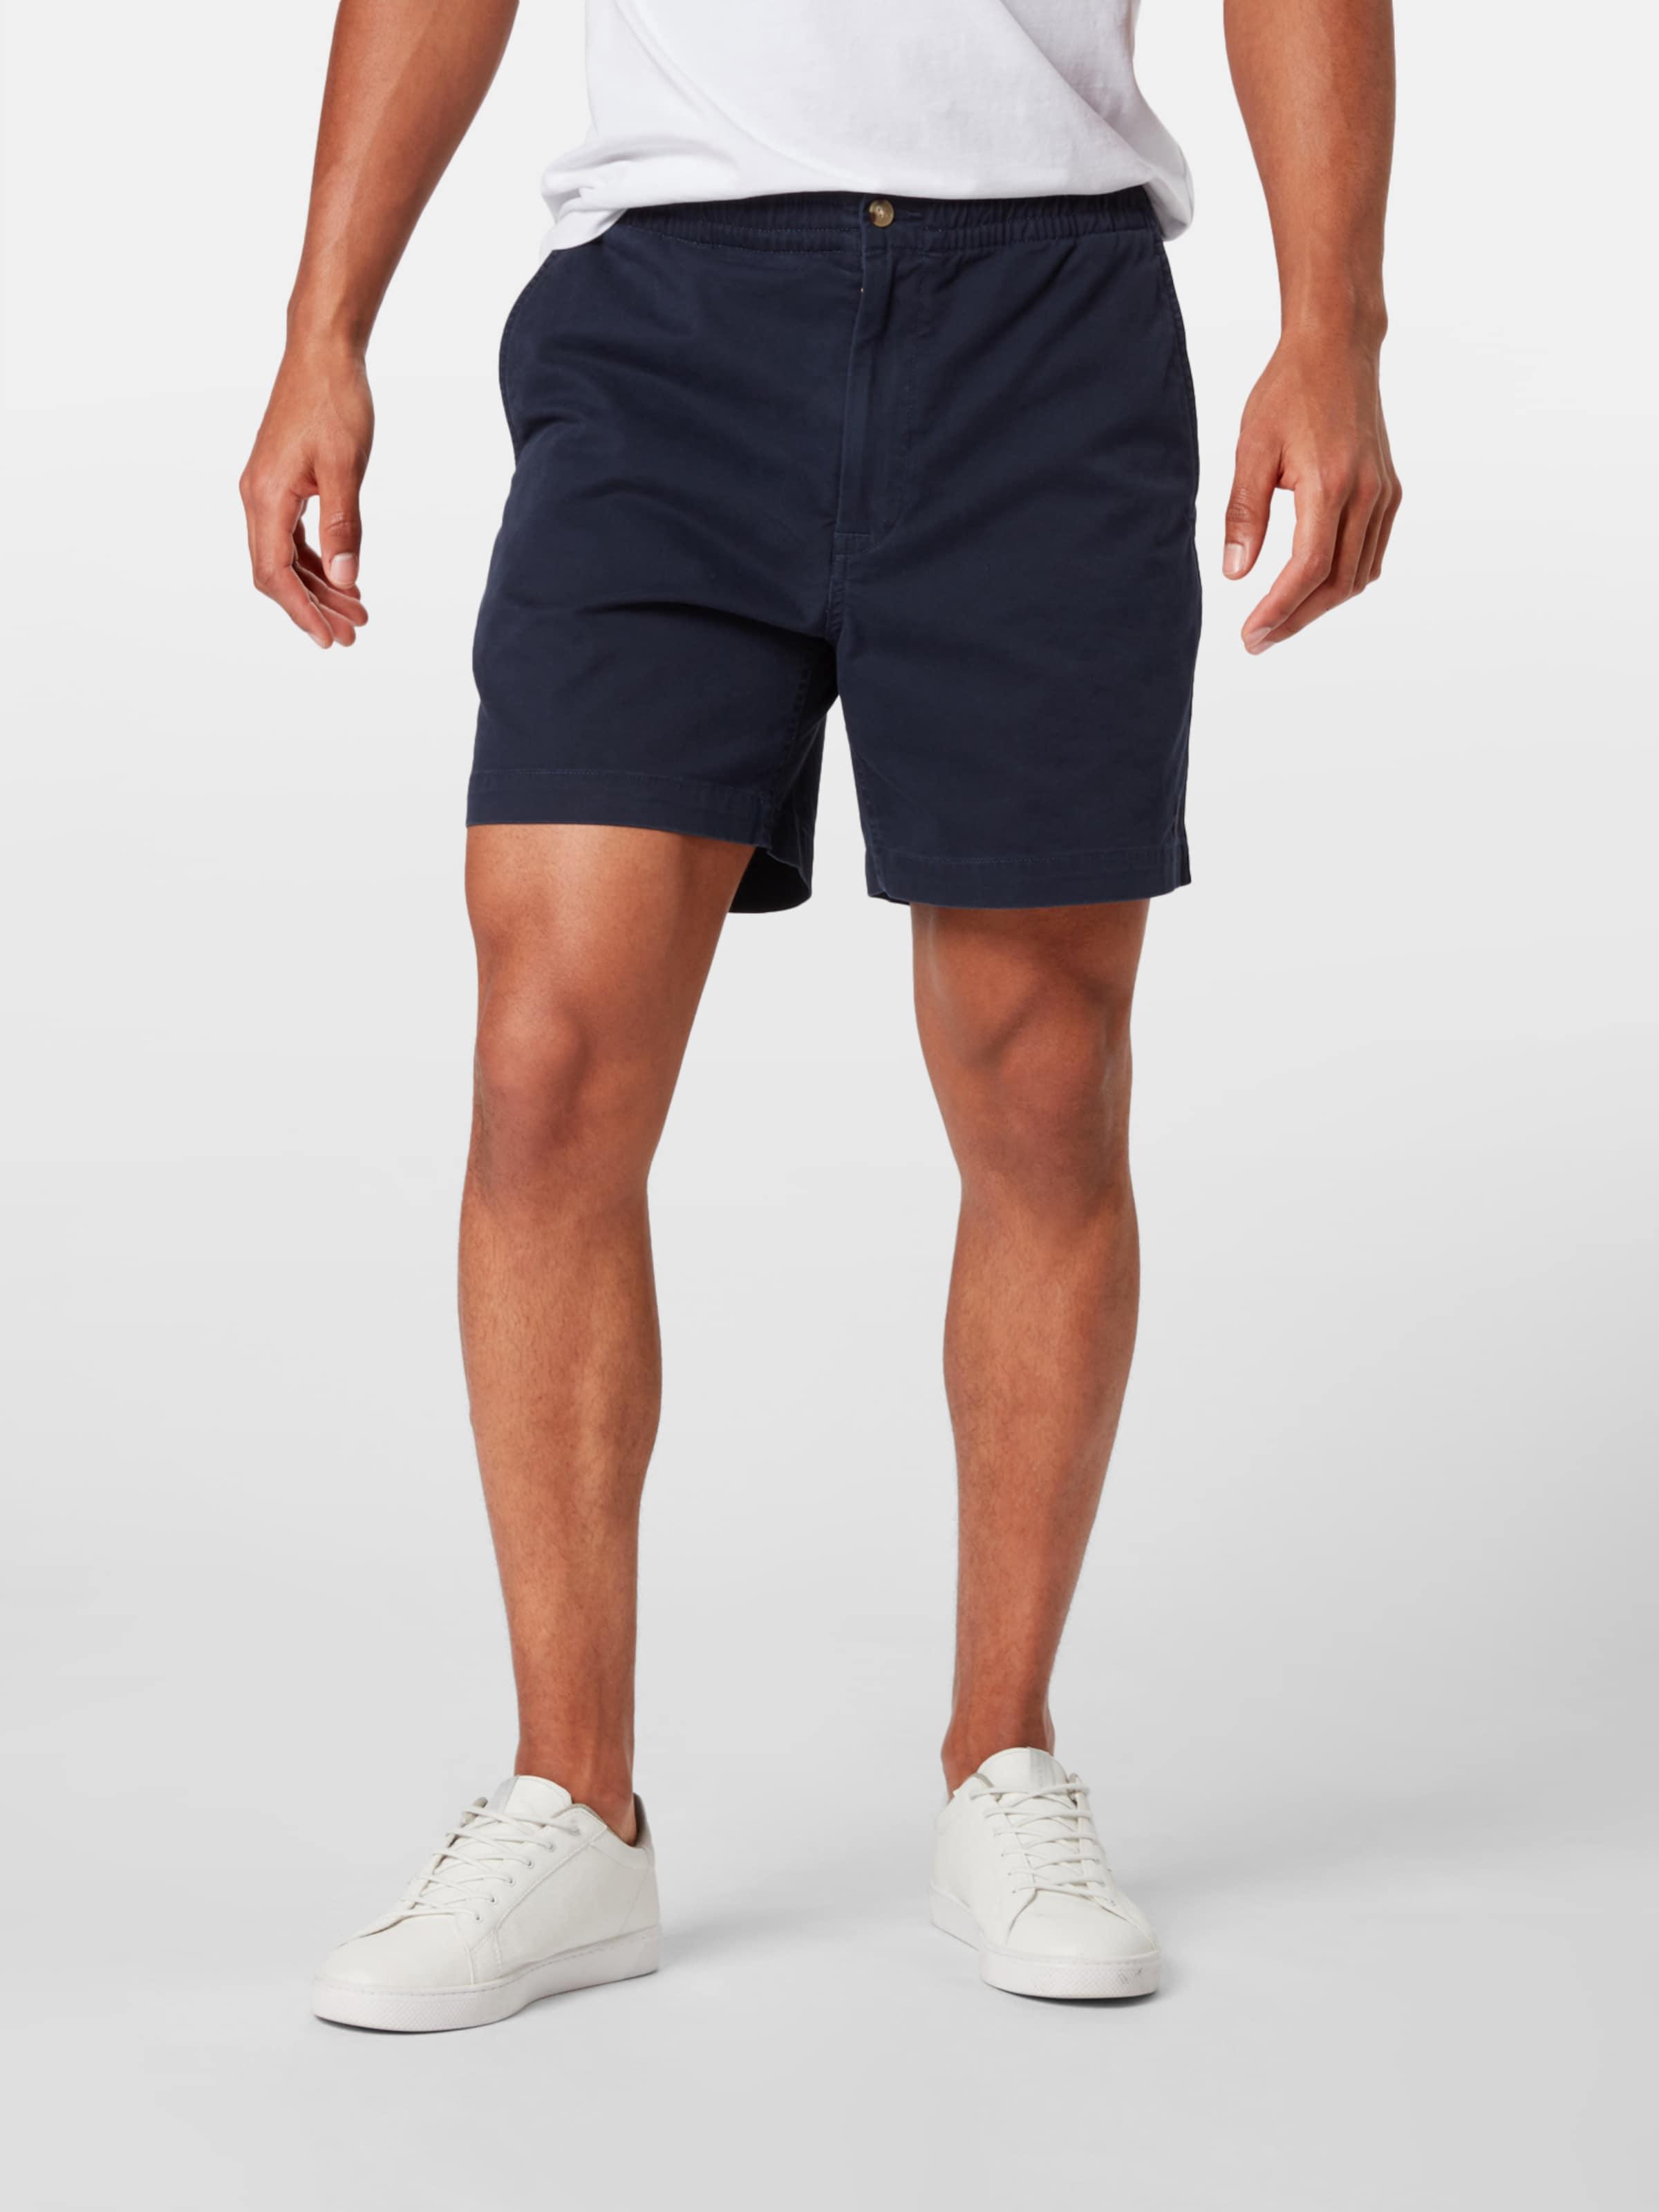 Polo 'cfprepsters Marine Chino short' Ralph En flat Lauren Pantalon lFcJTK1